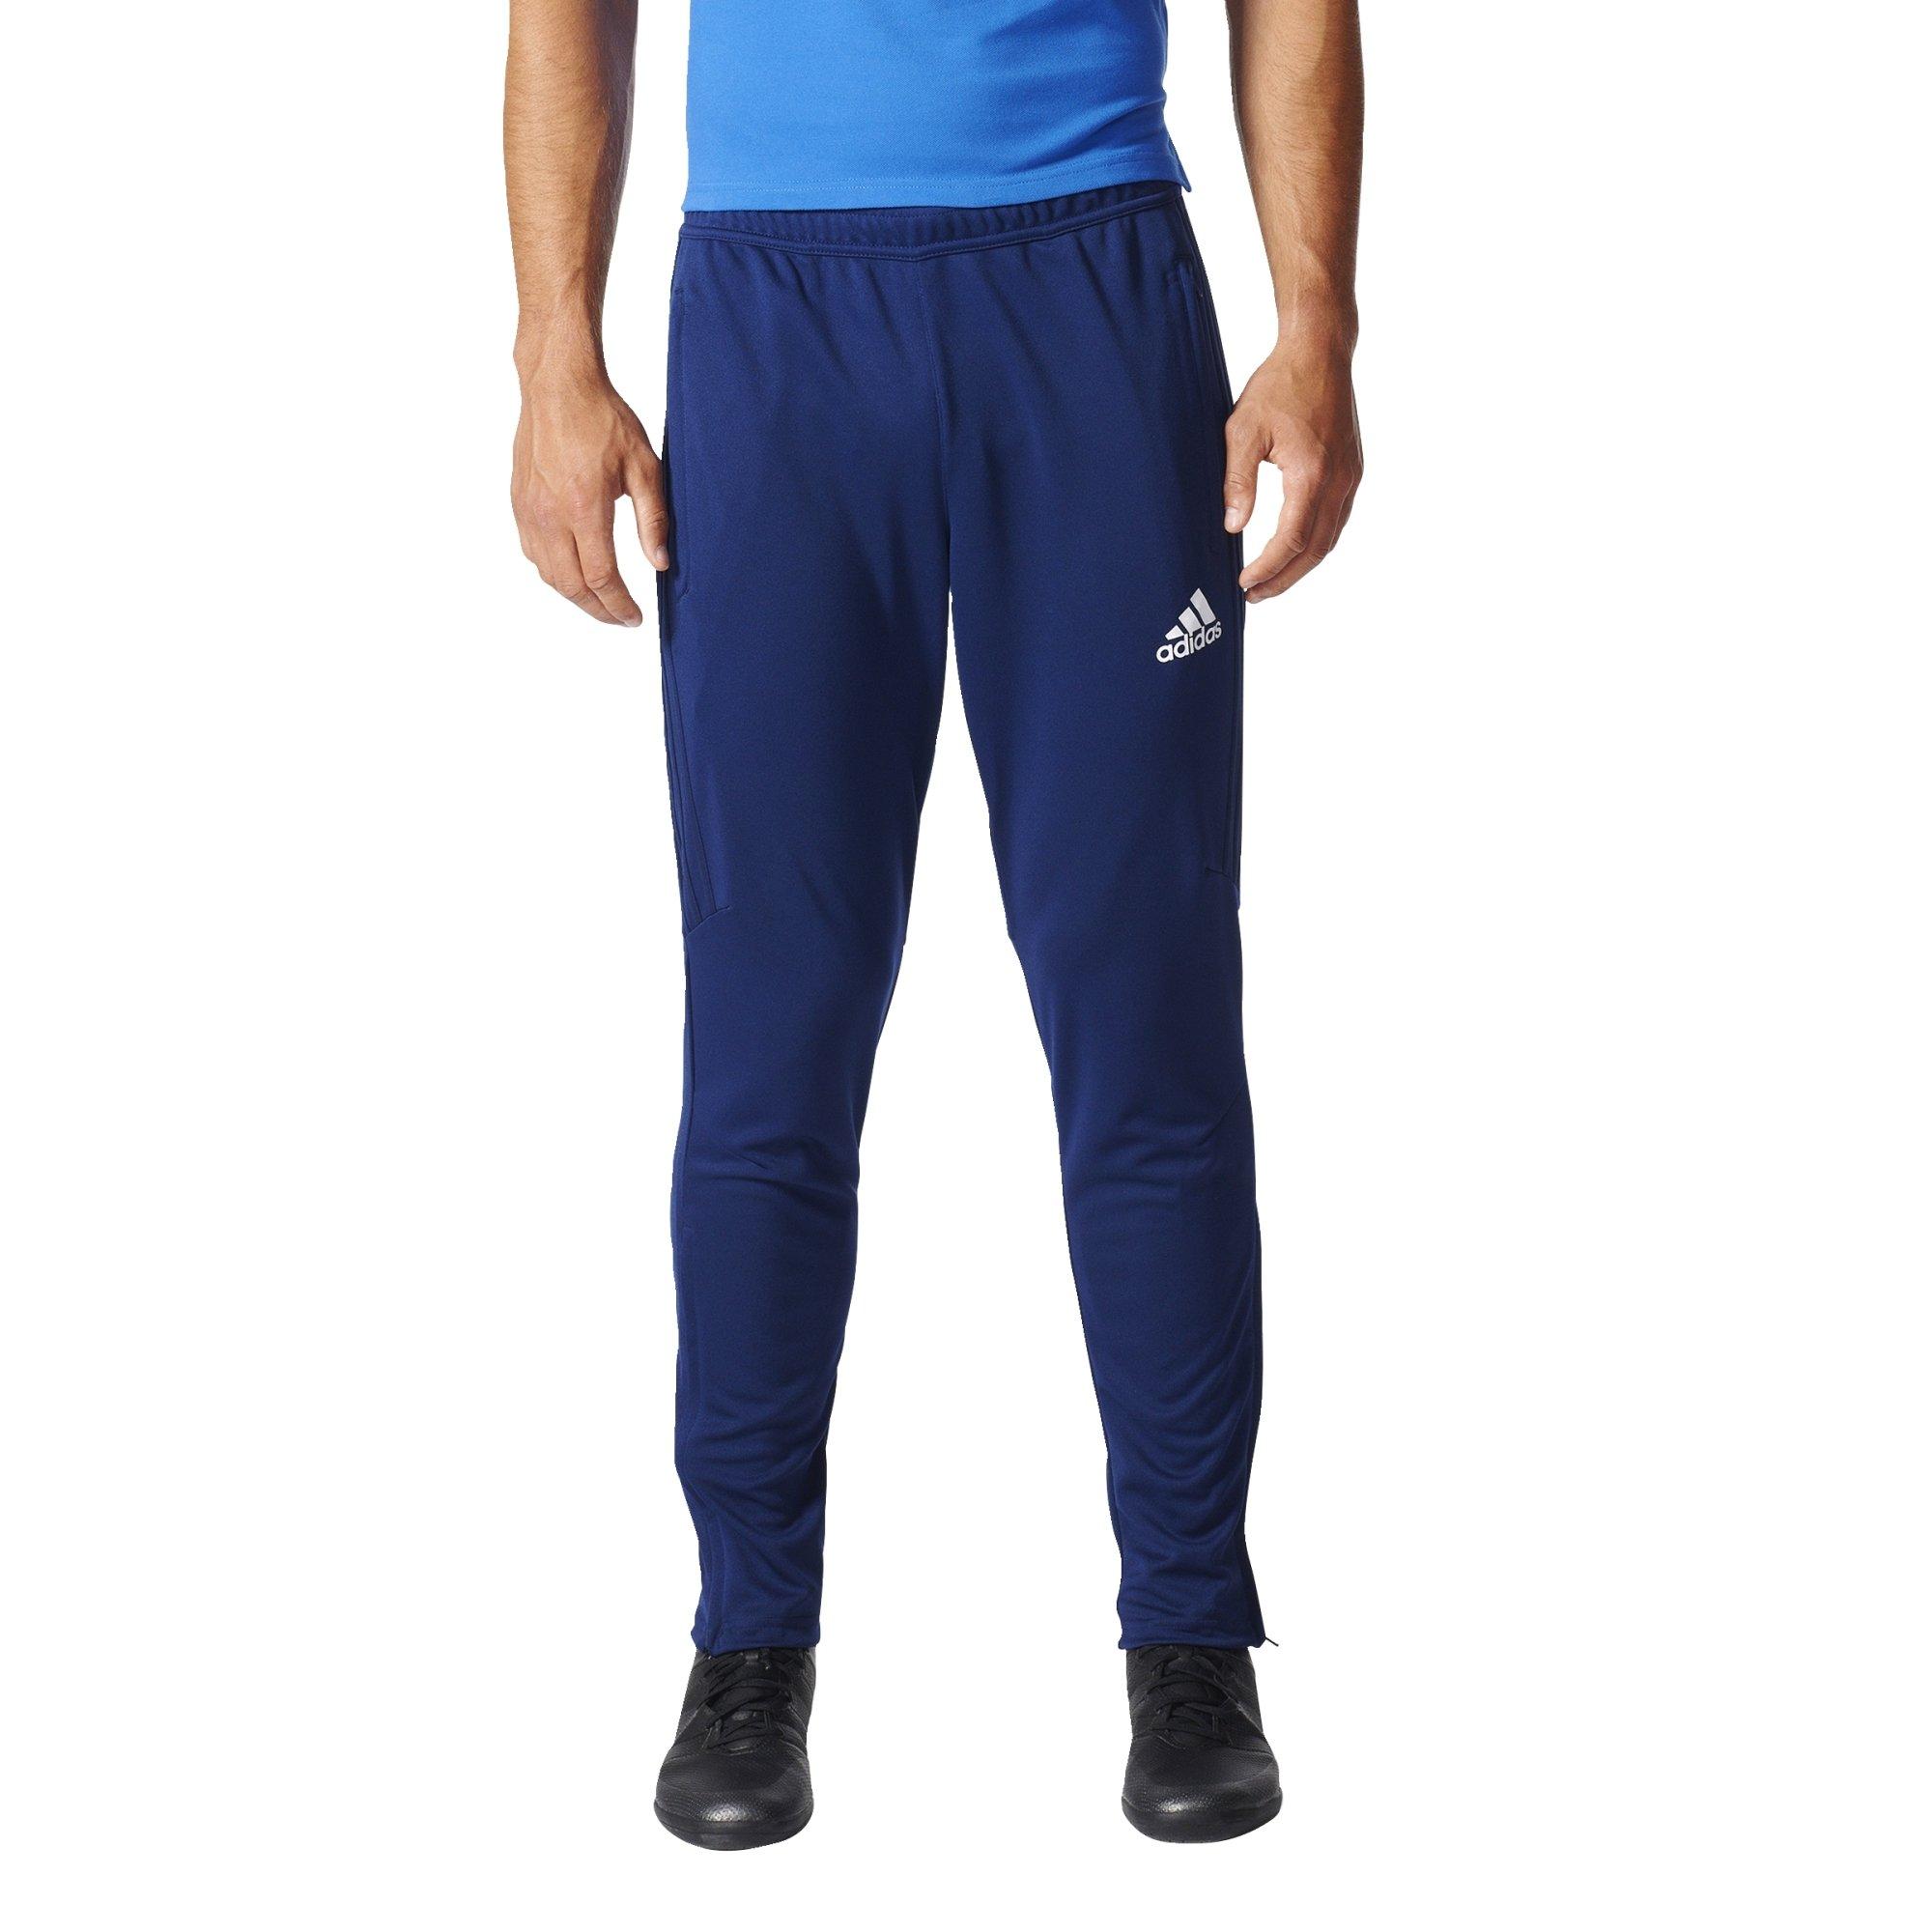 adidas Men's Soccer Tiro 17 Pants, Small, Dark Blue/White